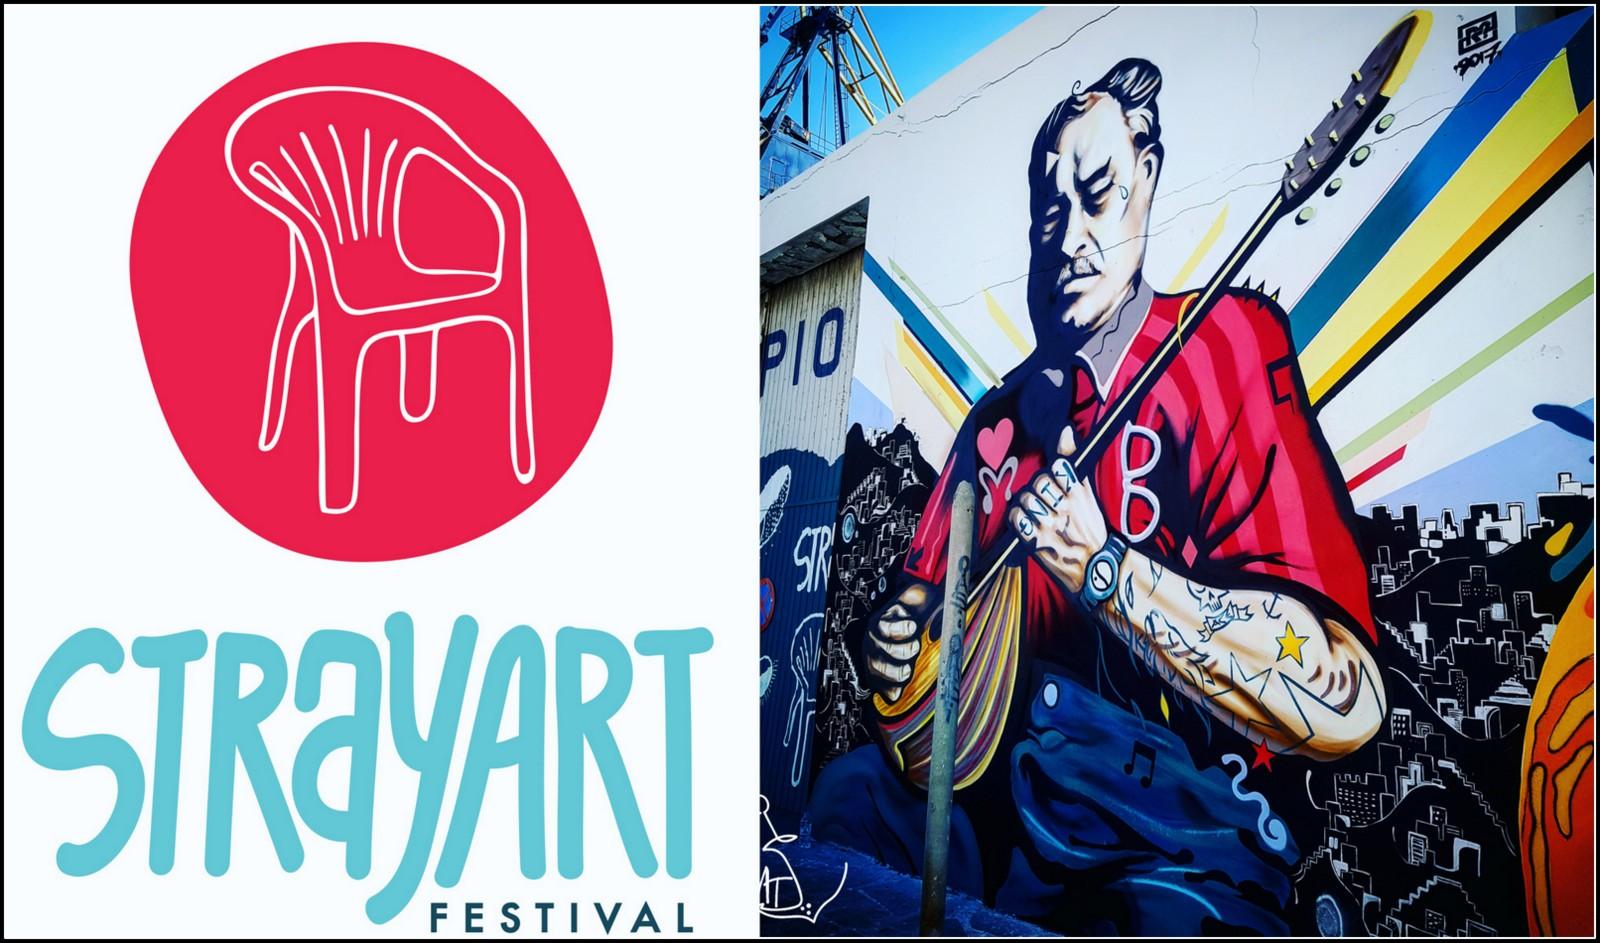 Stray Art Festival - Στόχος και όνειρο, είναι να μην μείνει ένα απλό event αλλά μια περιπλανώμενη γιορτή